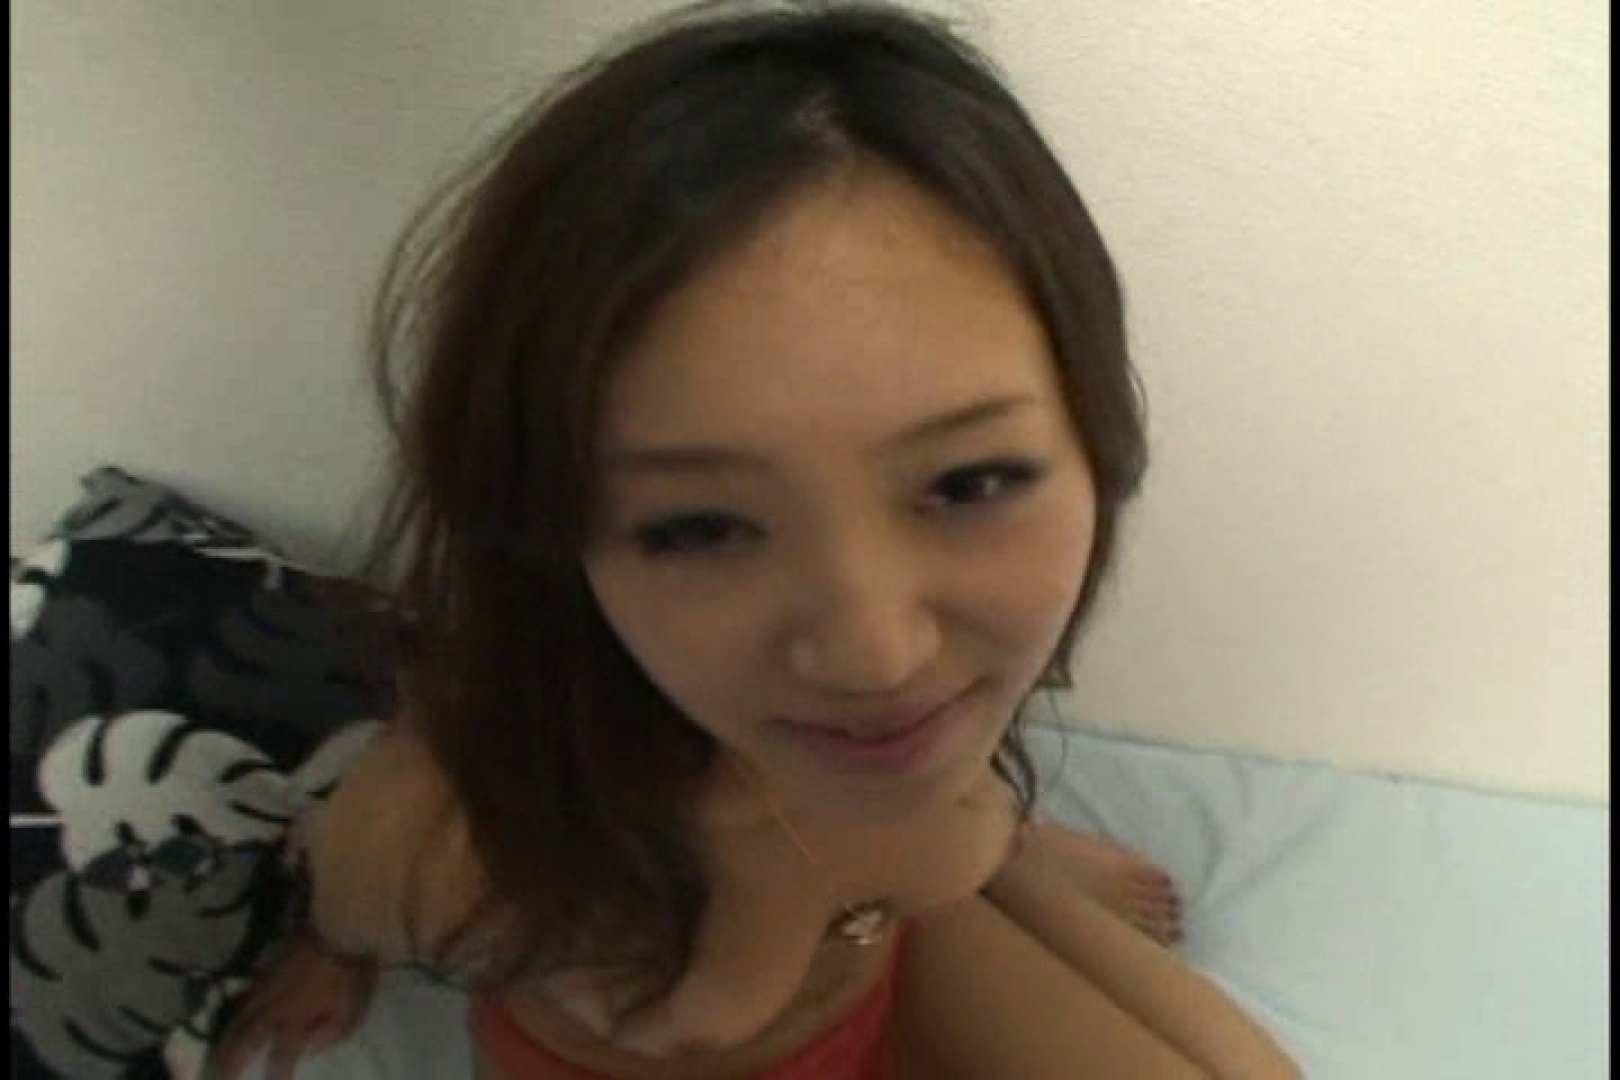 JDハンター全国ツアー vol.023 前編 いやらしい女子大生 セックス画像 97連発 86